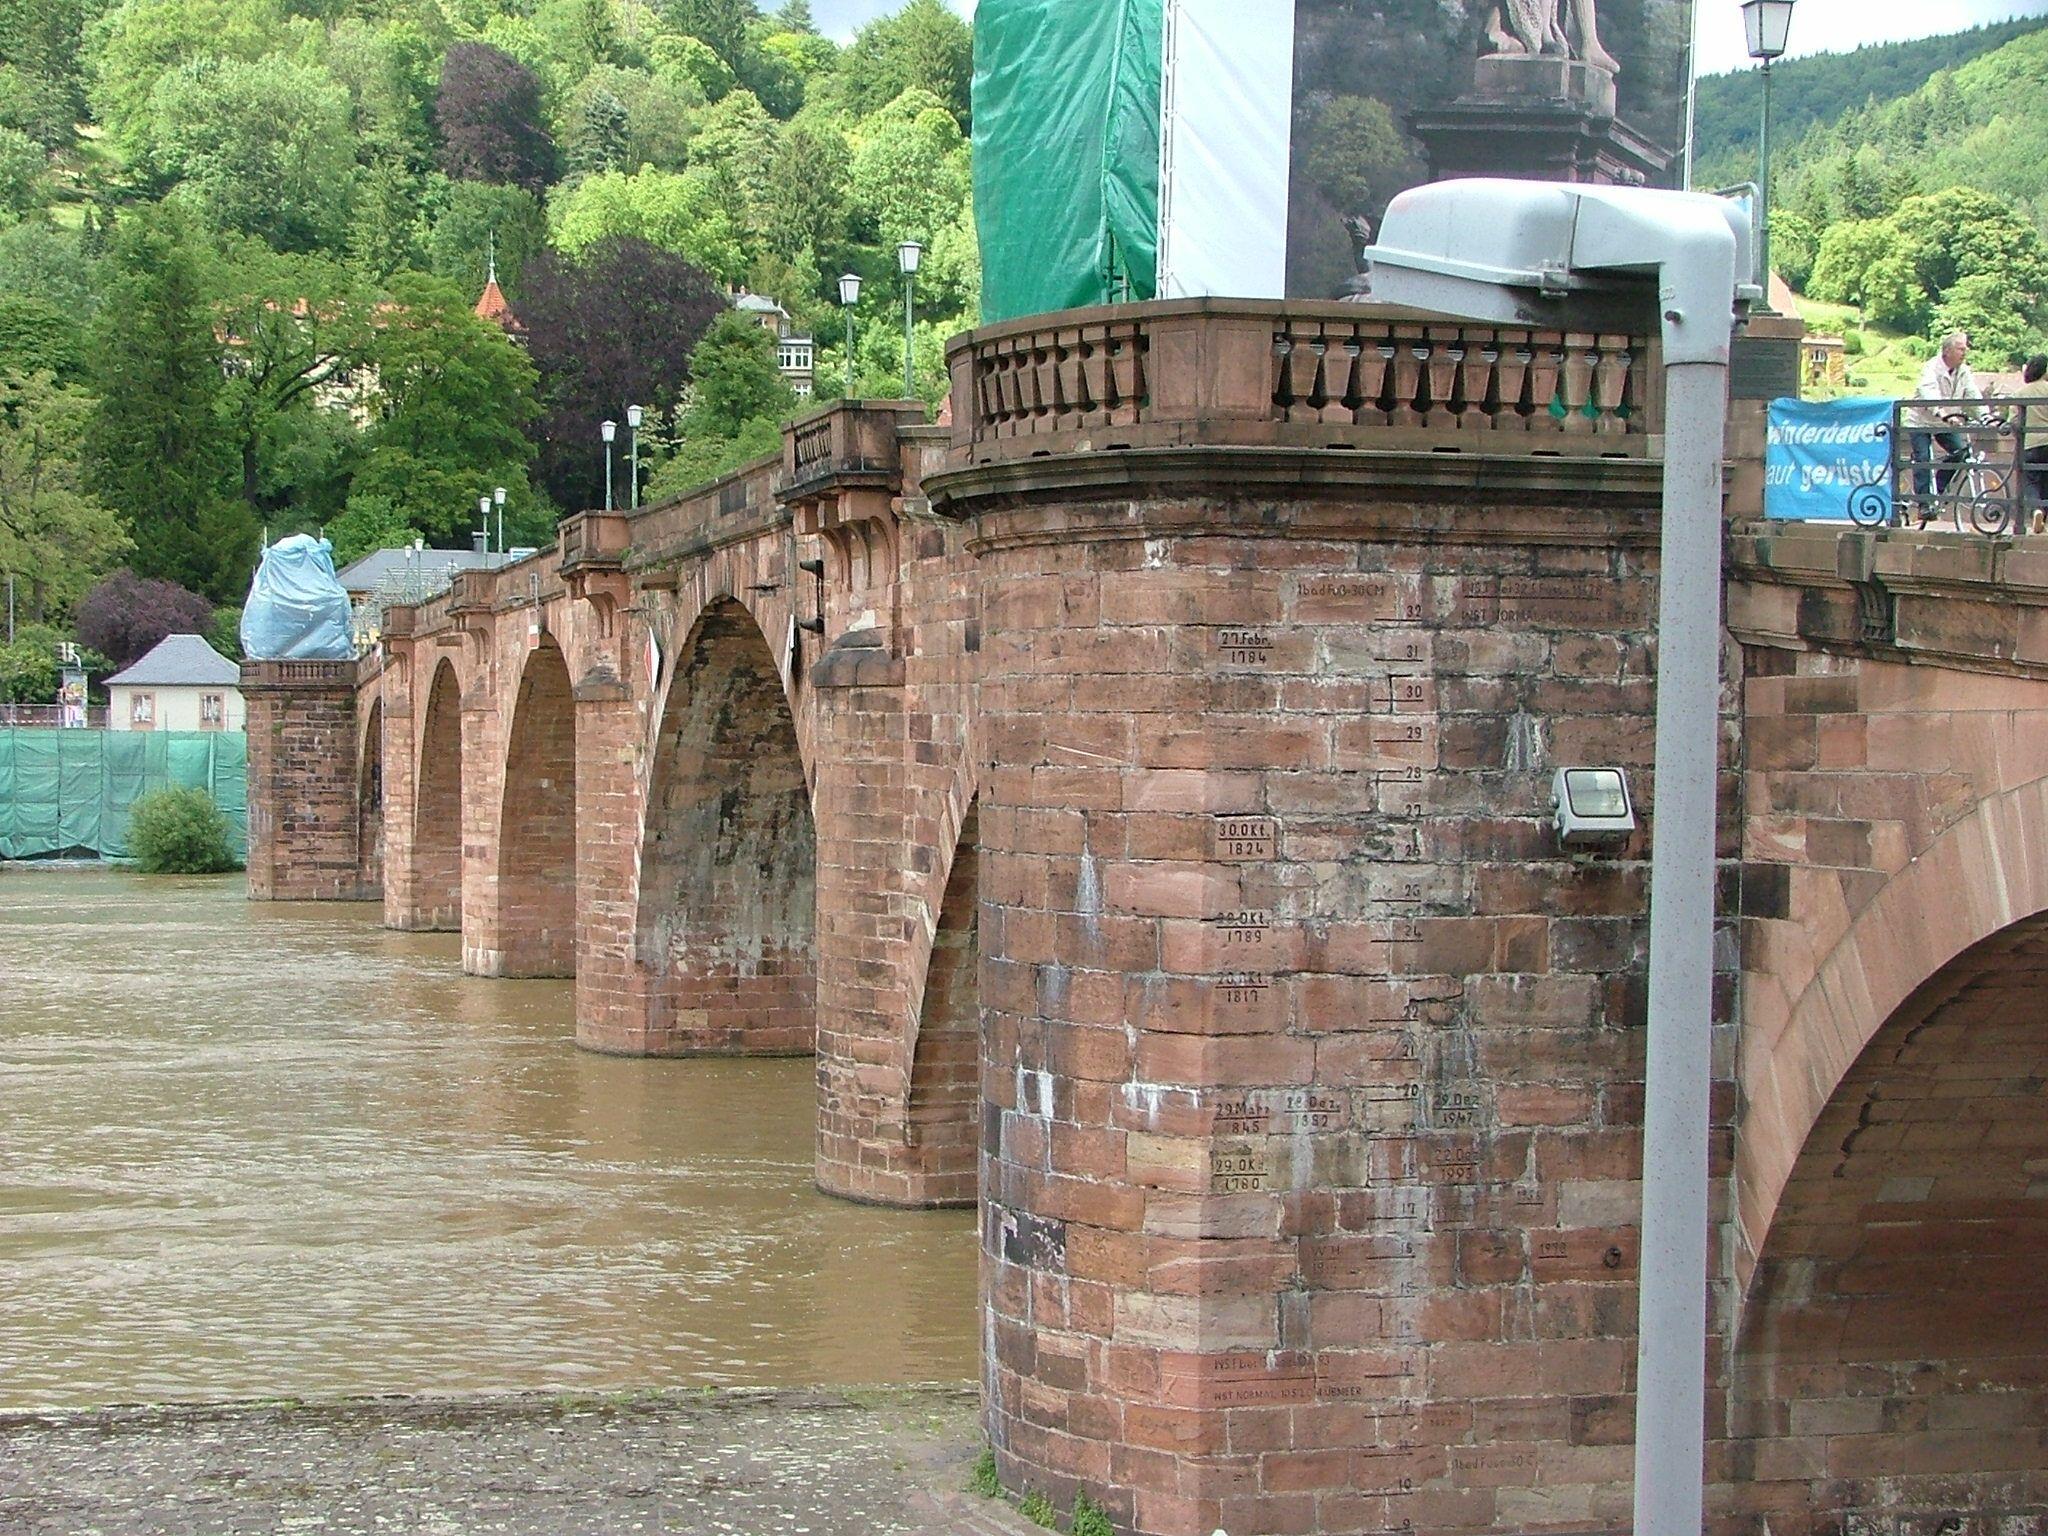 Old Heidelberg bridge in Heidelberg, Germany. Had replaced a wooden bridge occupying same site since 1284.